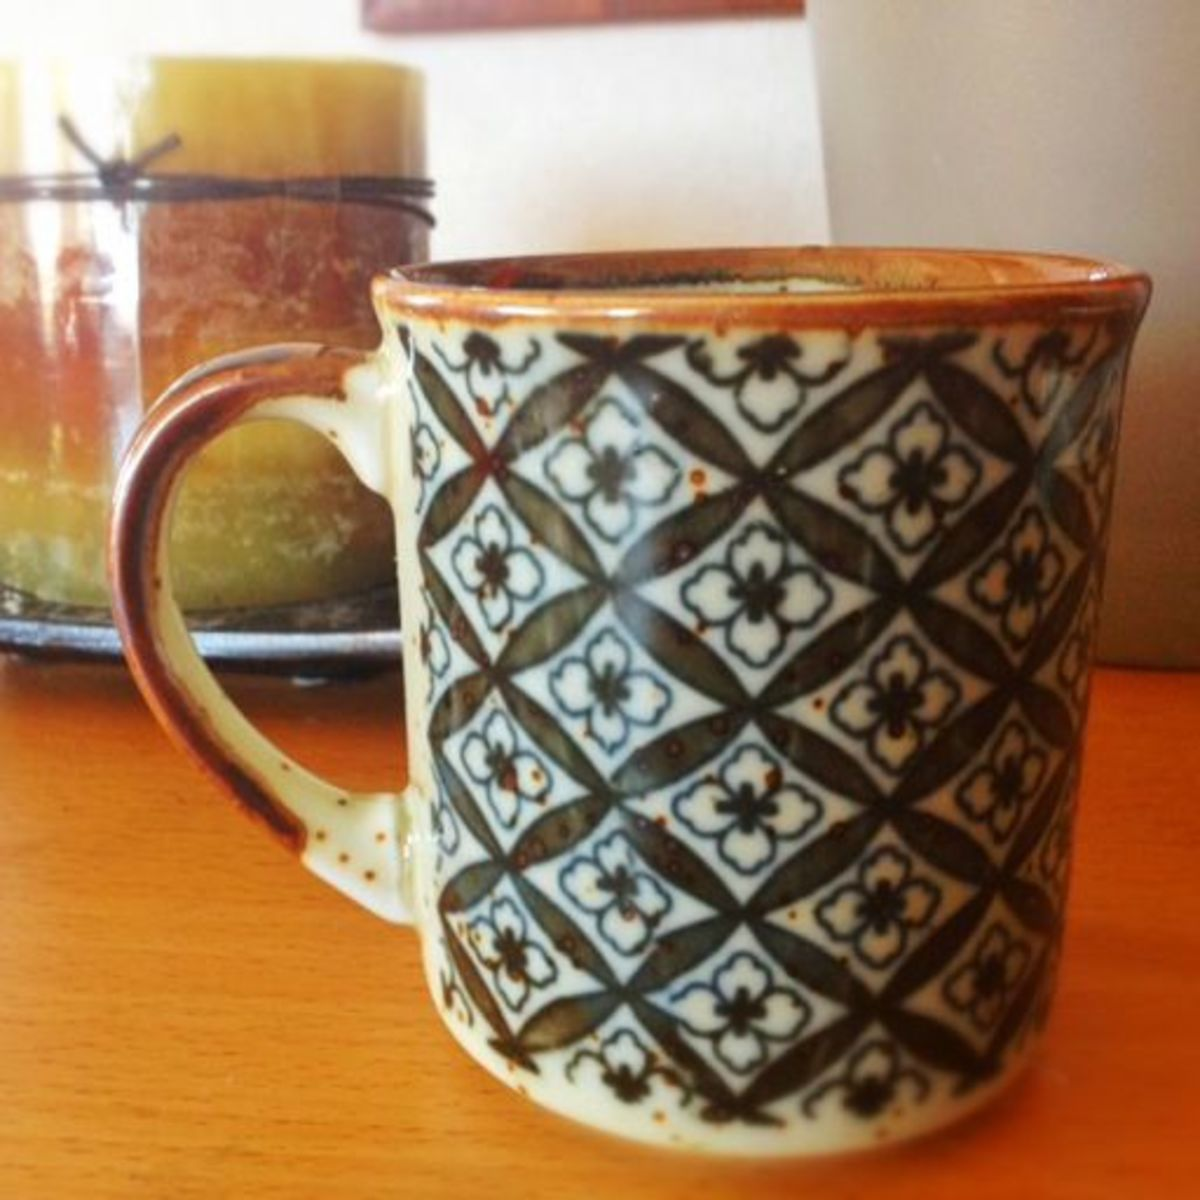 Vintage mug I found at a craft fair.